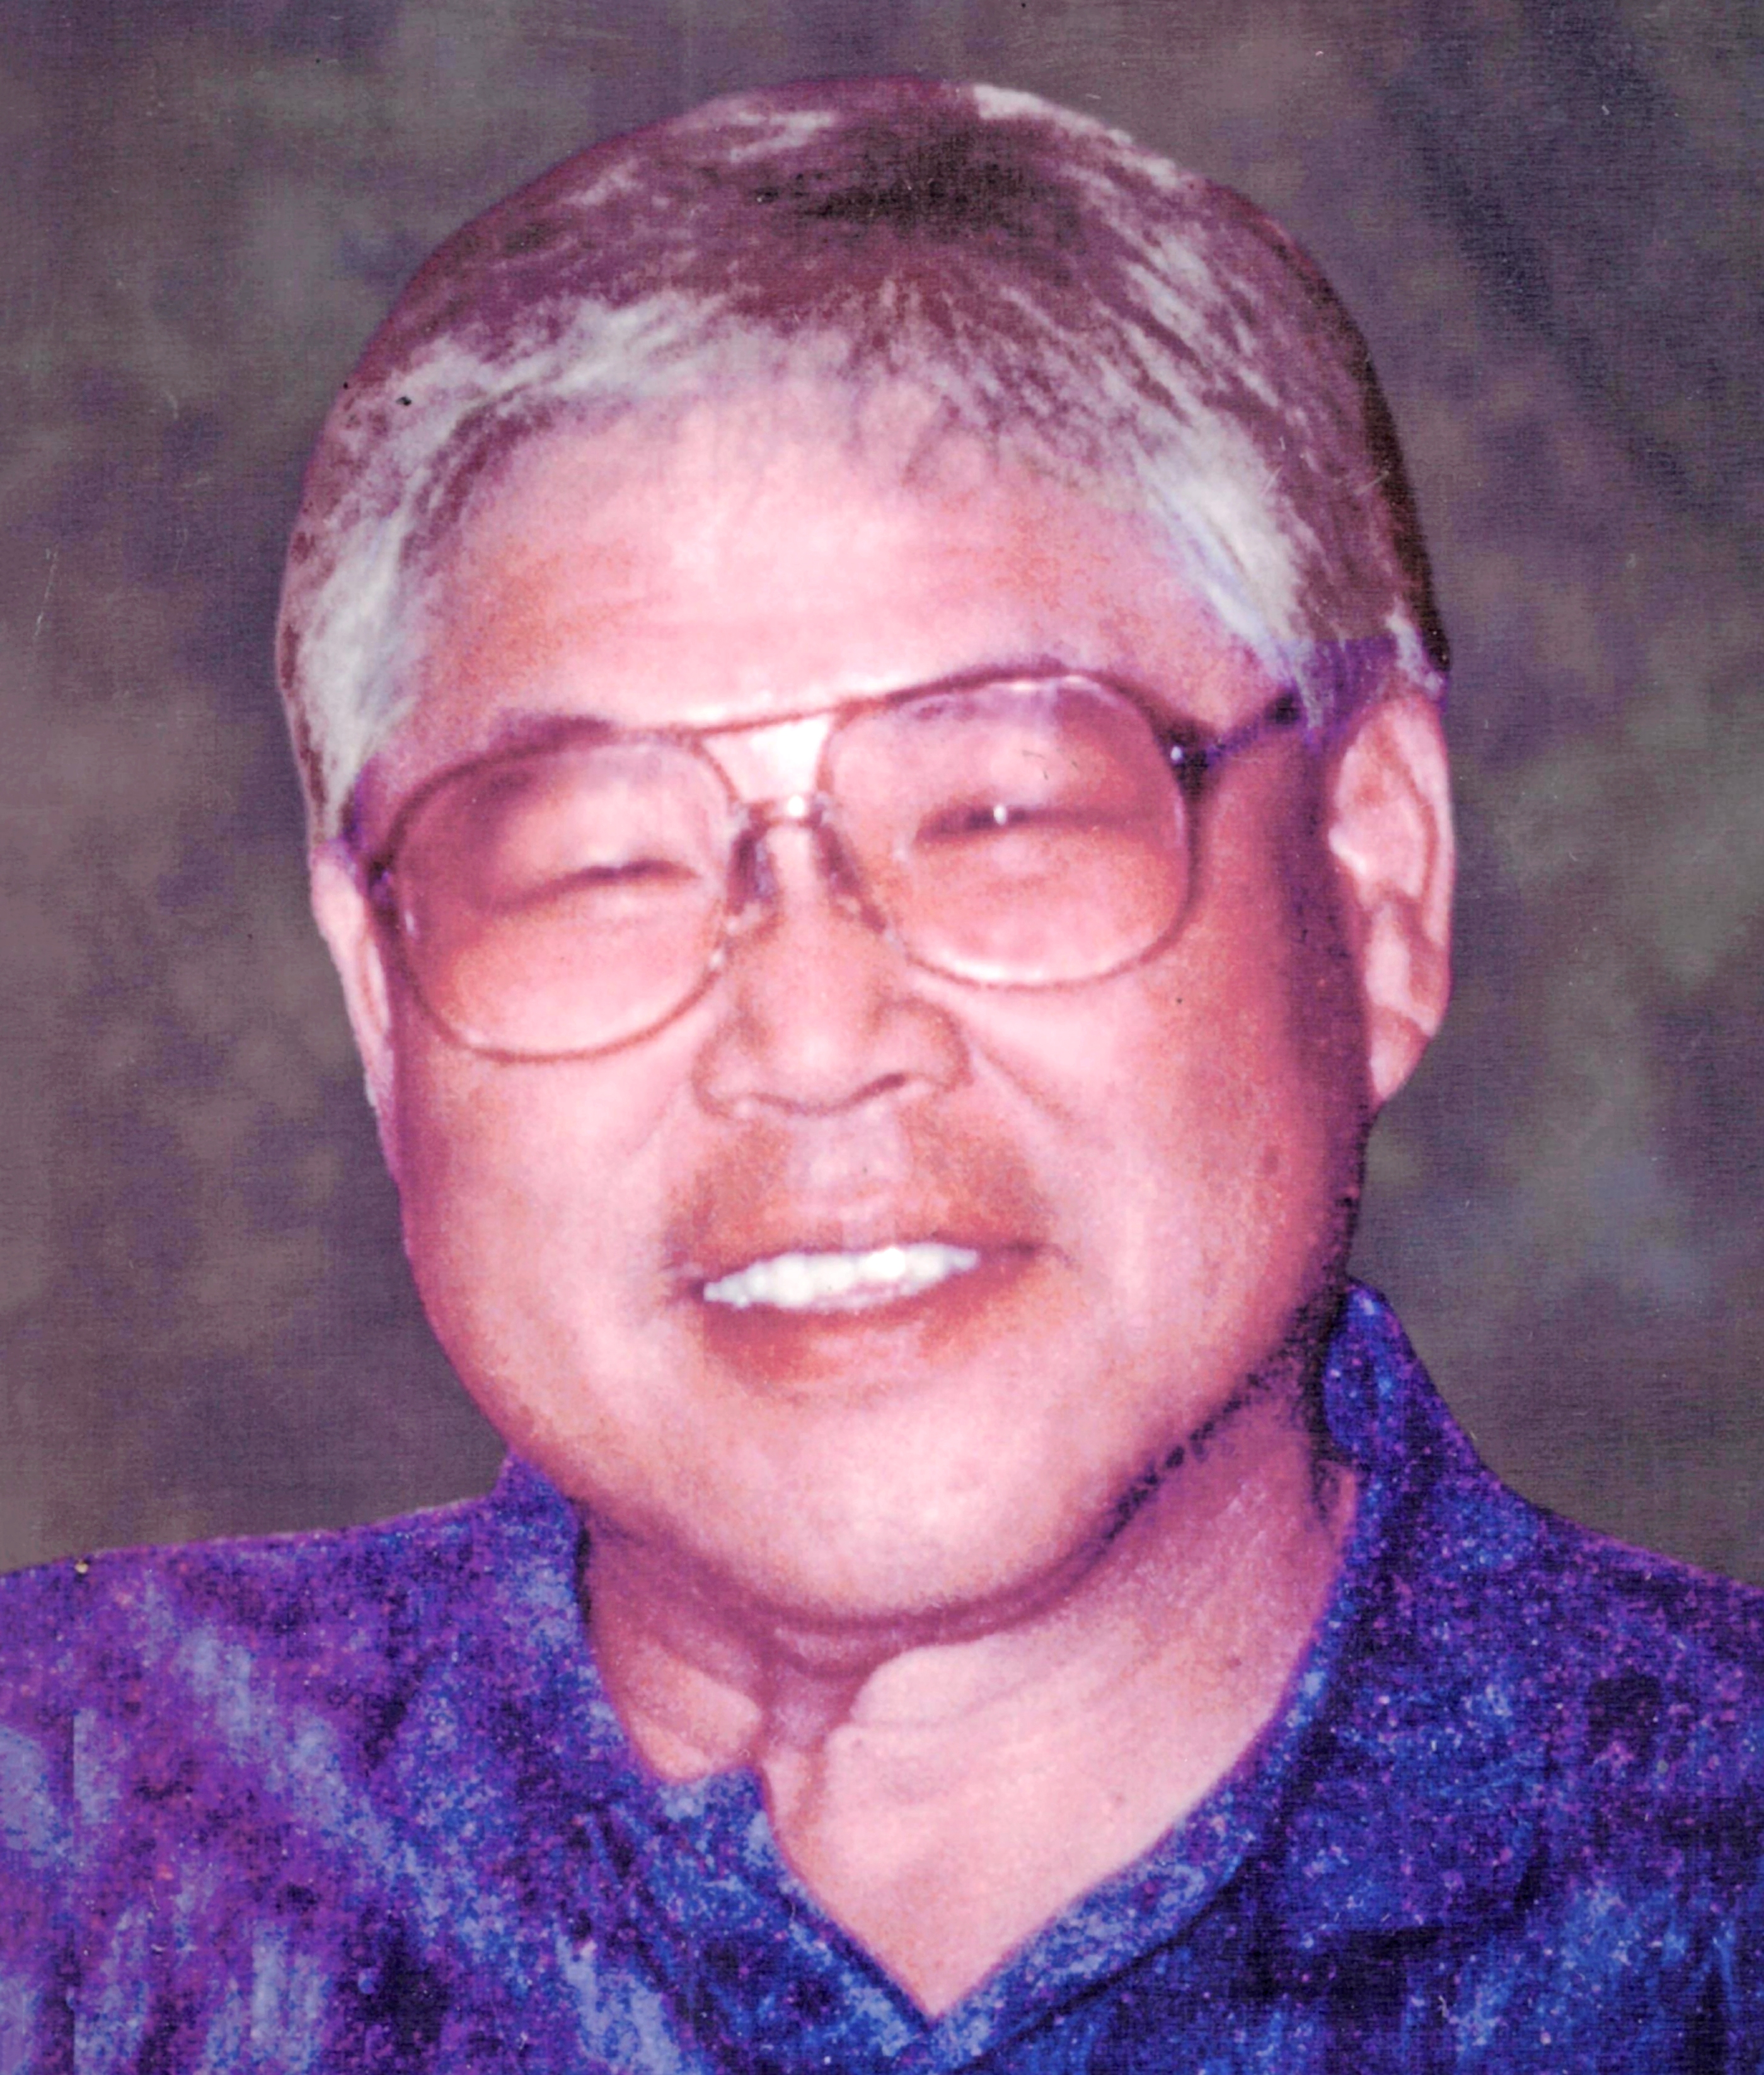 Norman S. Chun